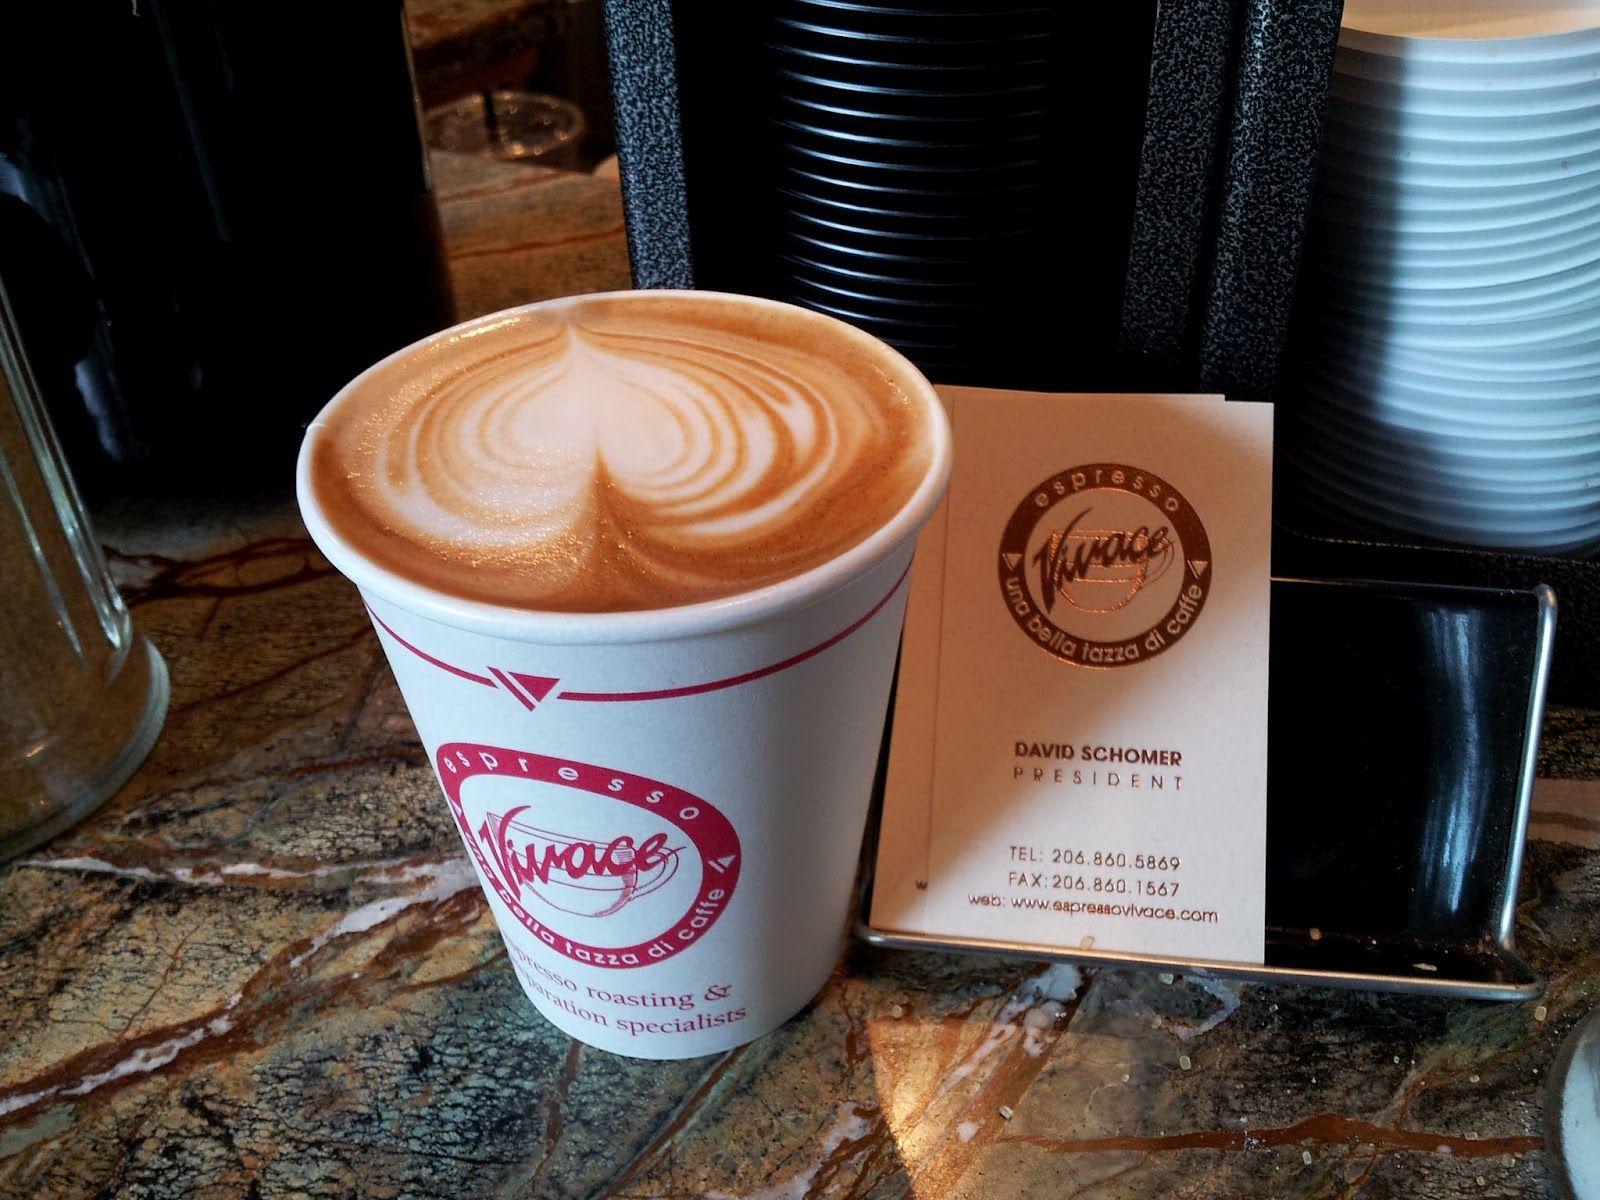 Seattleflyerguy S All Purpose Travel Blog Top 15 Seattle Coffee Shops 1 Through 5 Seattle Coffee Seattle Coffee Shops Coffee Shop